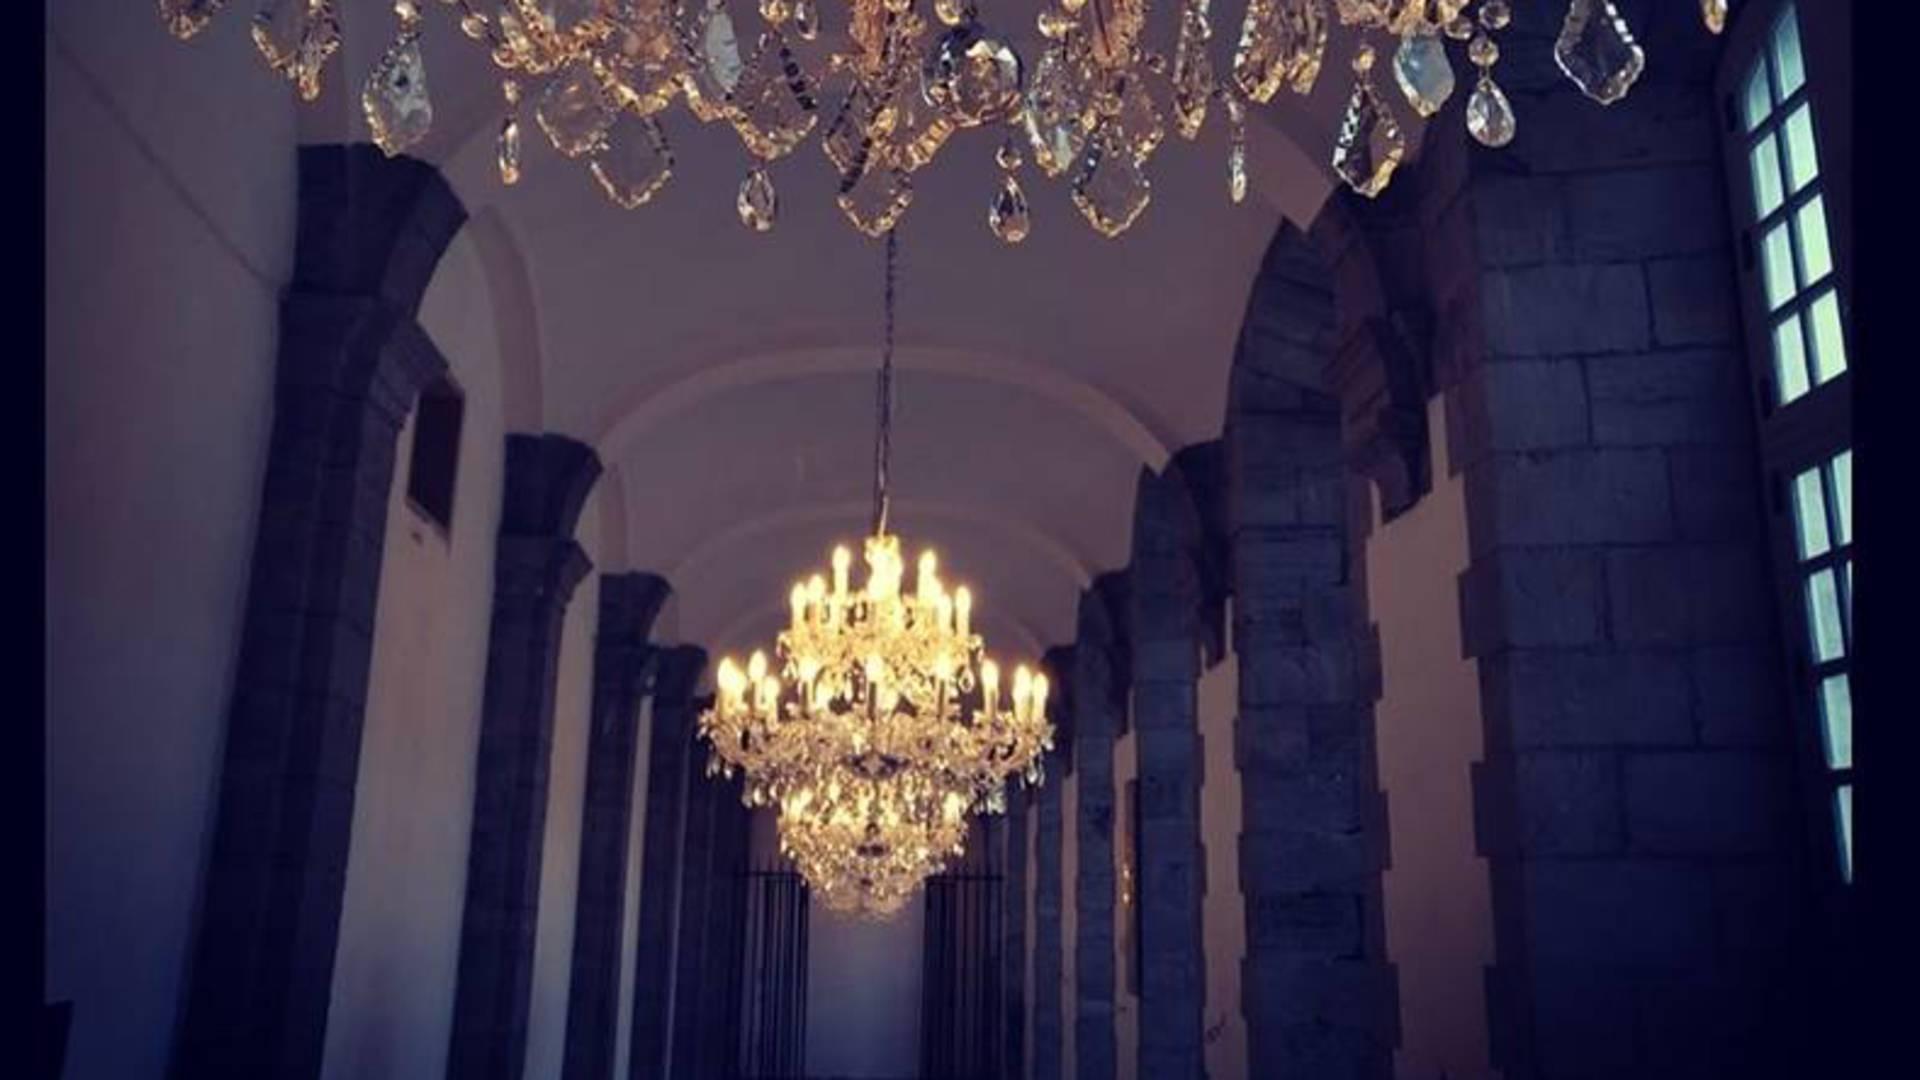 Valenciennes Royal Hainaut spa & resort